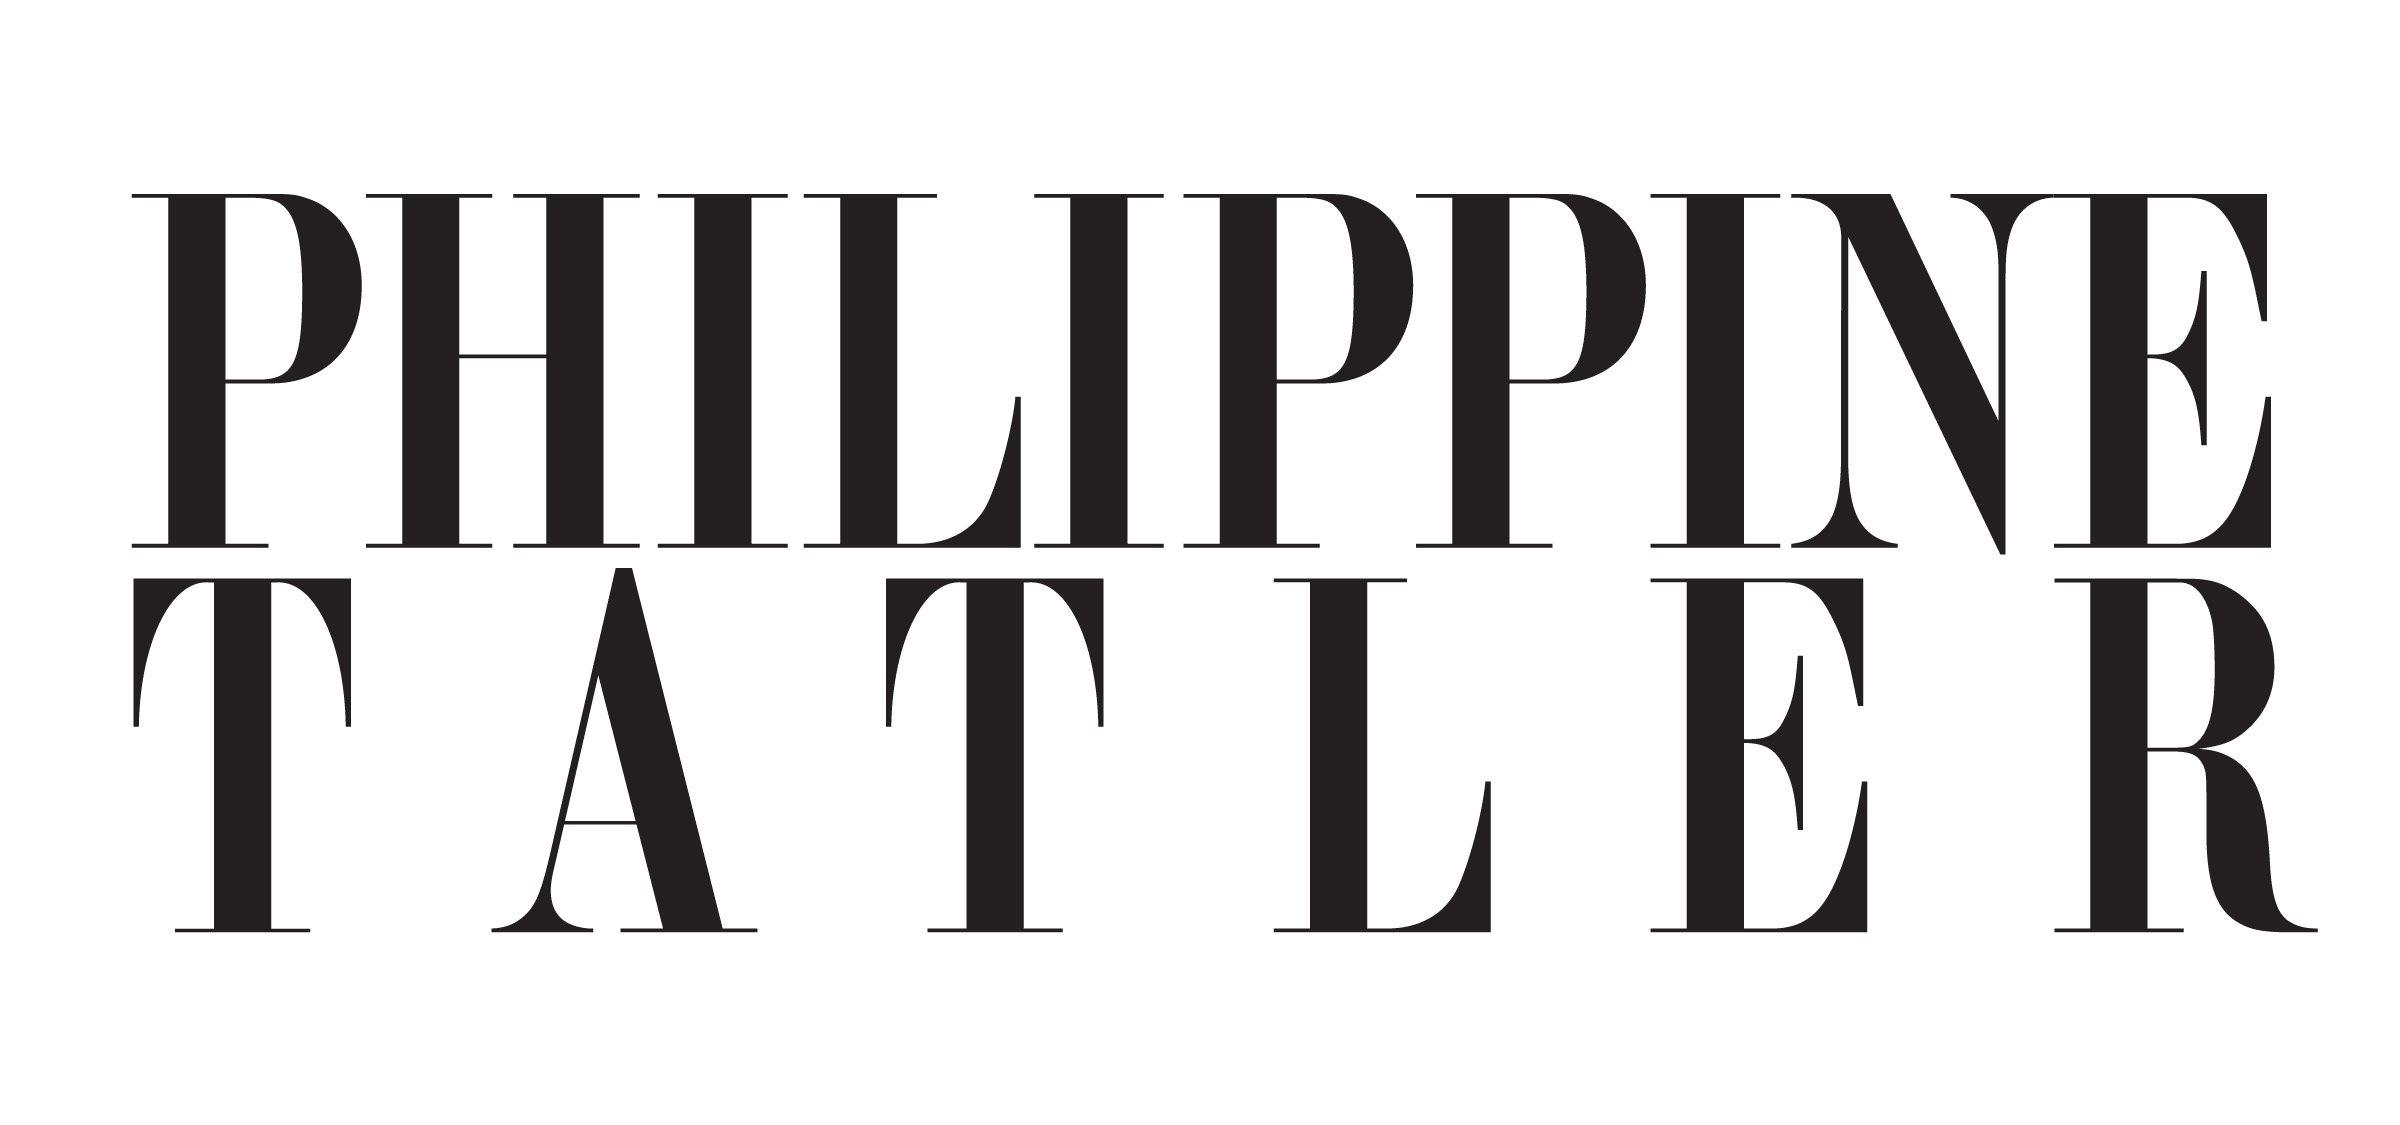 STYLE MEDIA, INC. (PHILIPPINE TATLER)